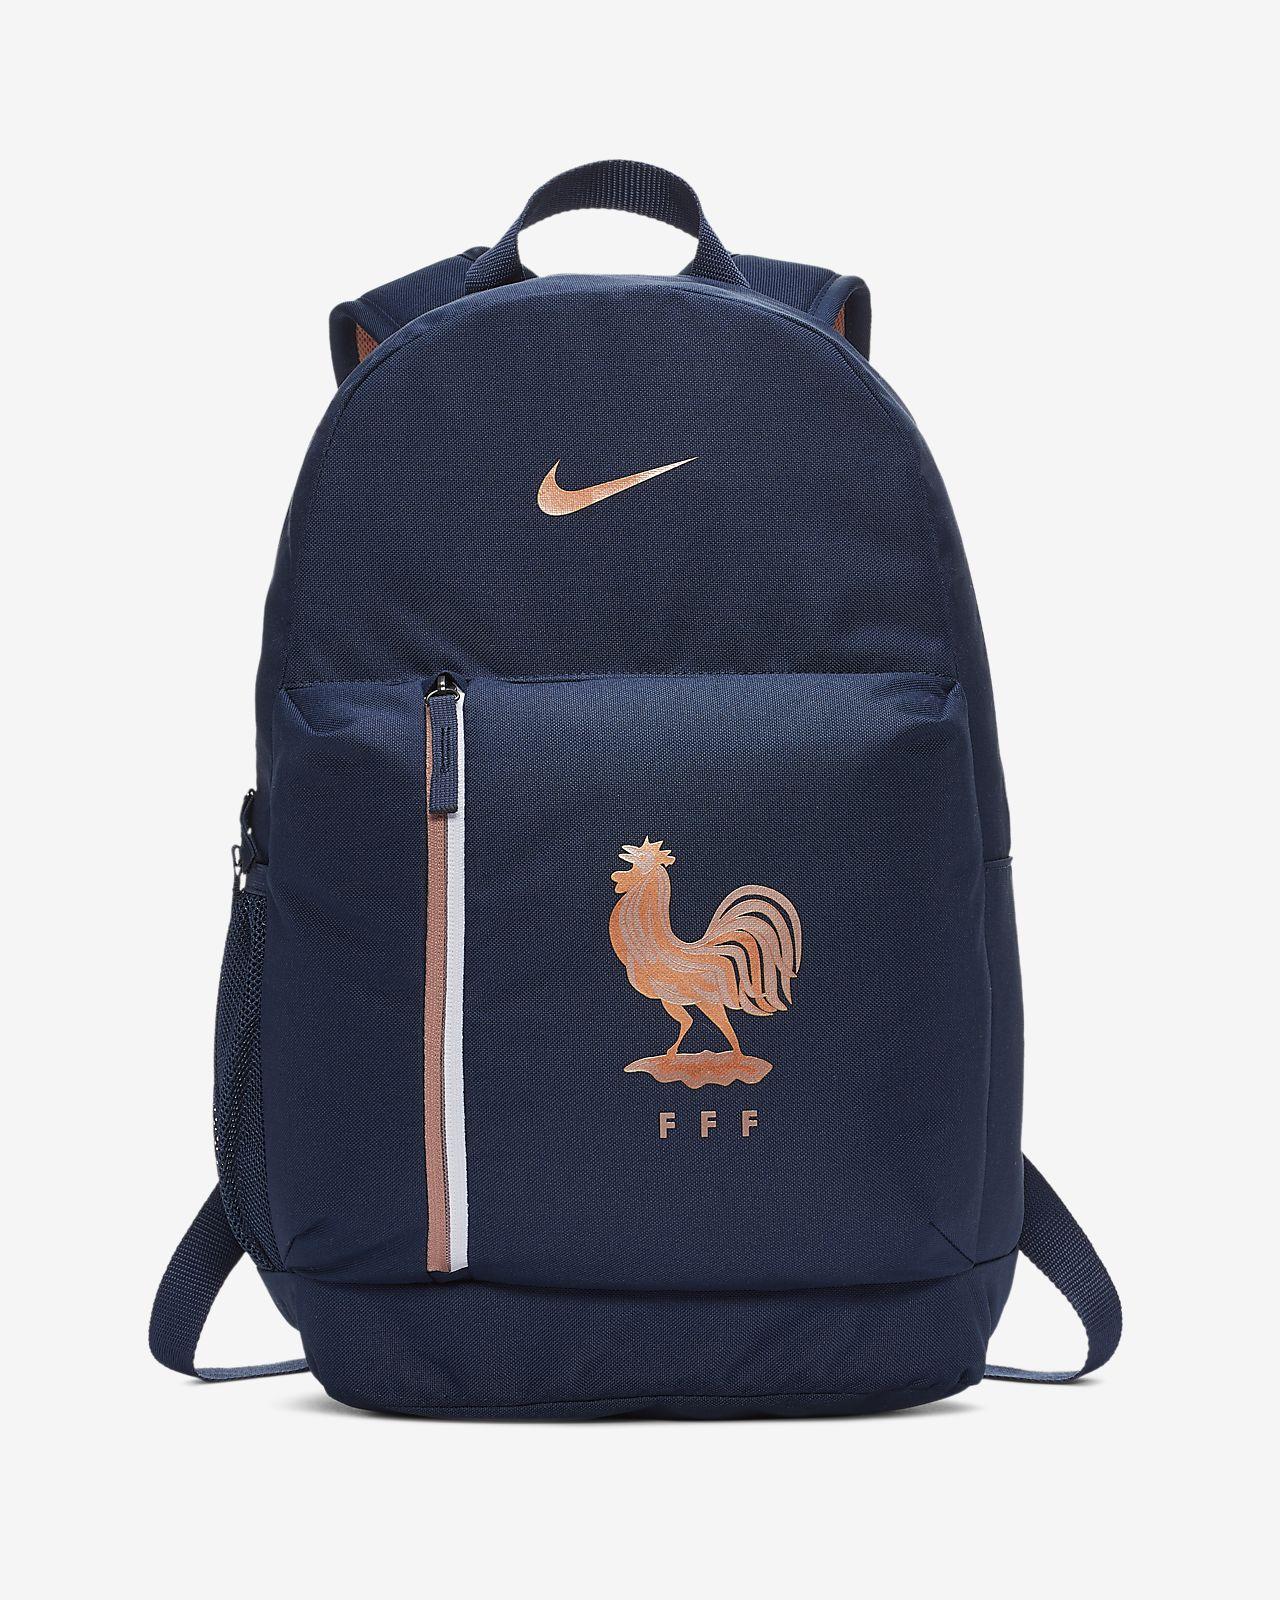 FFF Stadium Backpack